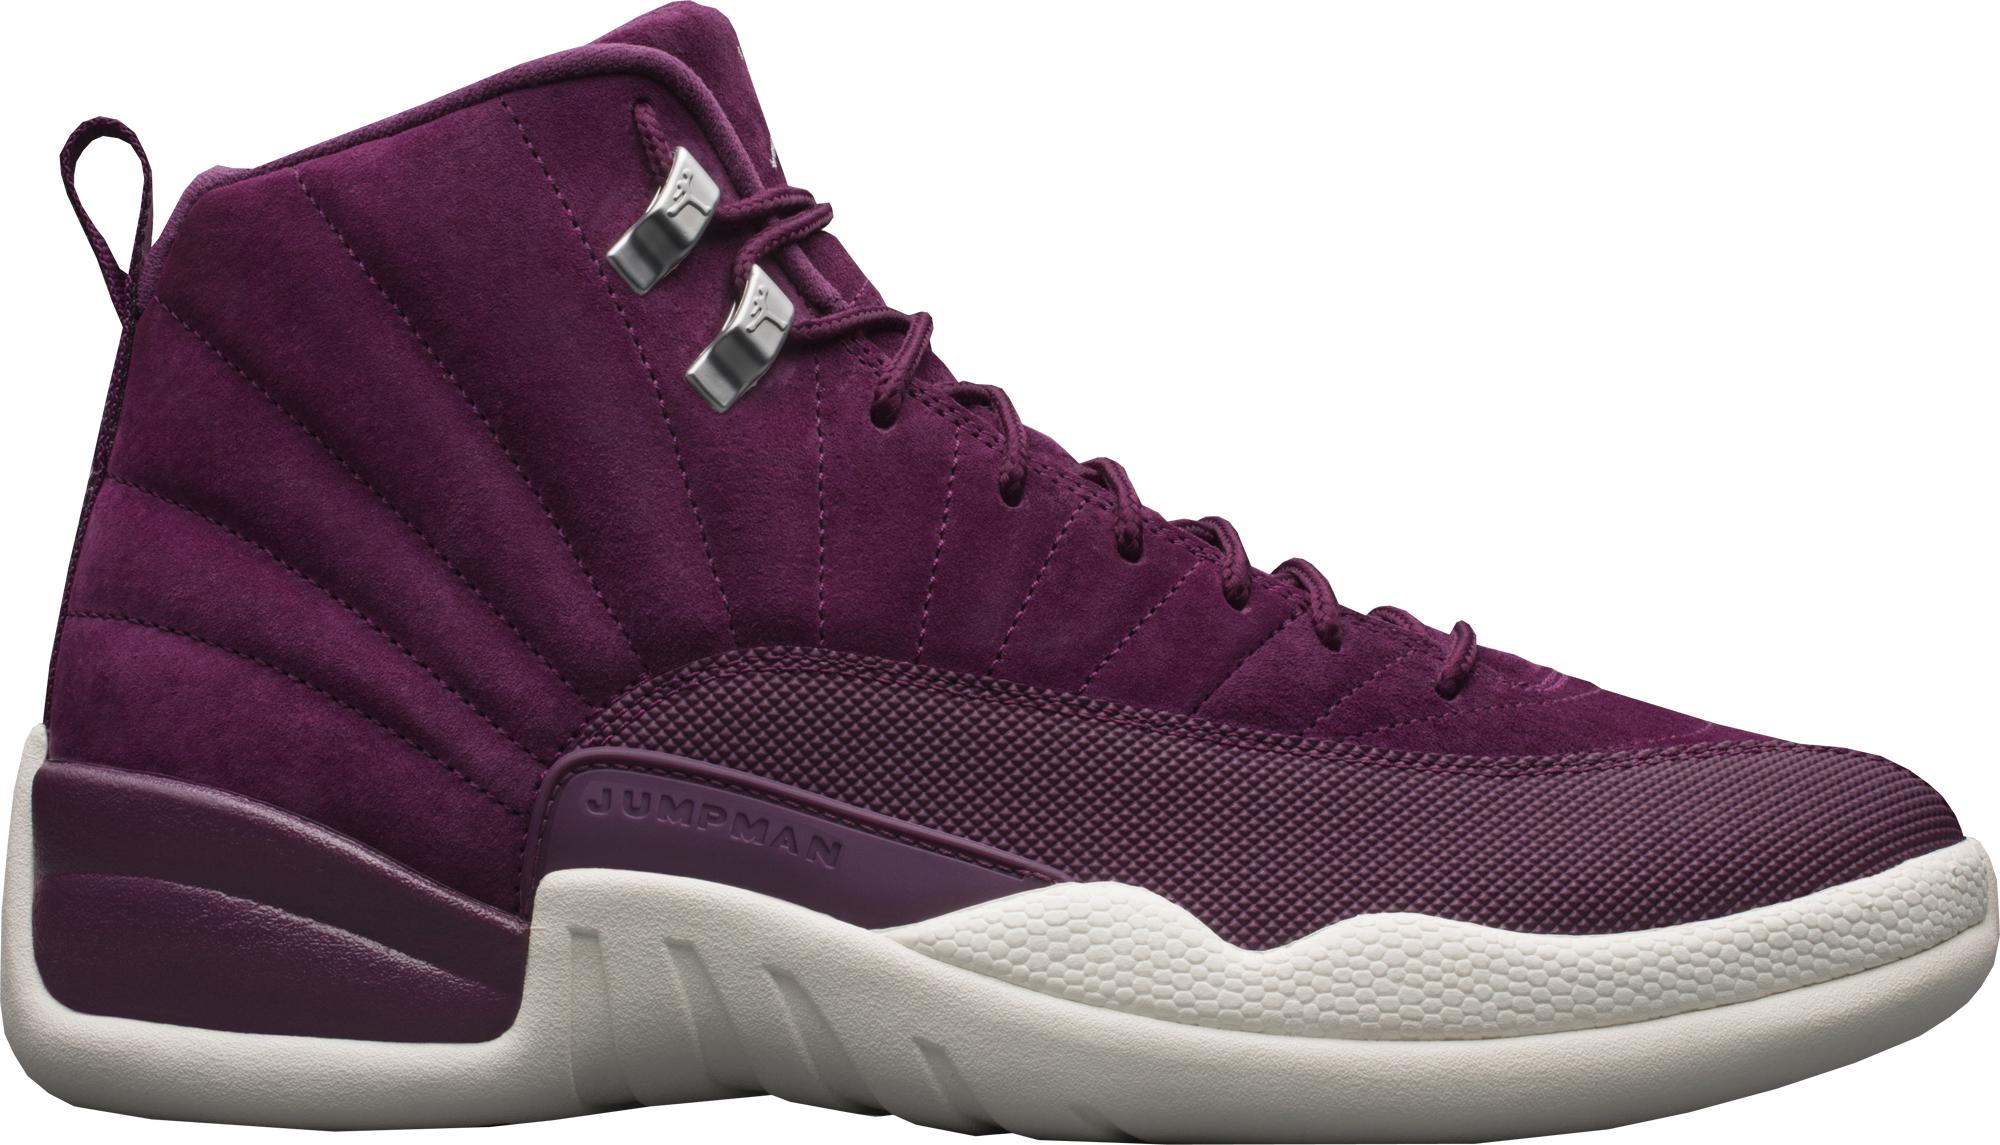 Jordan 12 Retro Bordeaux